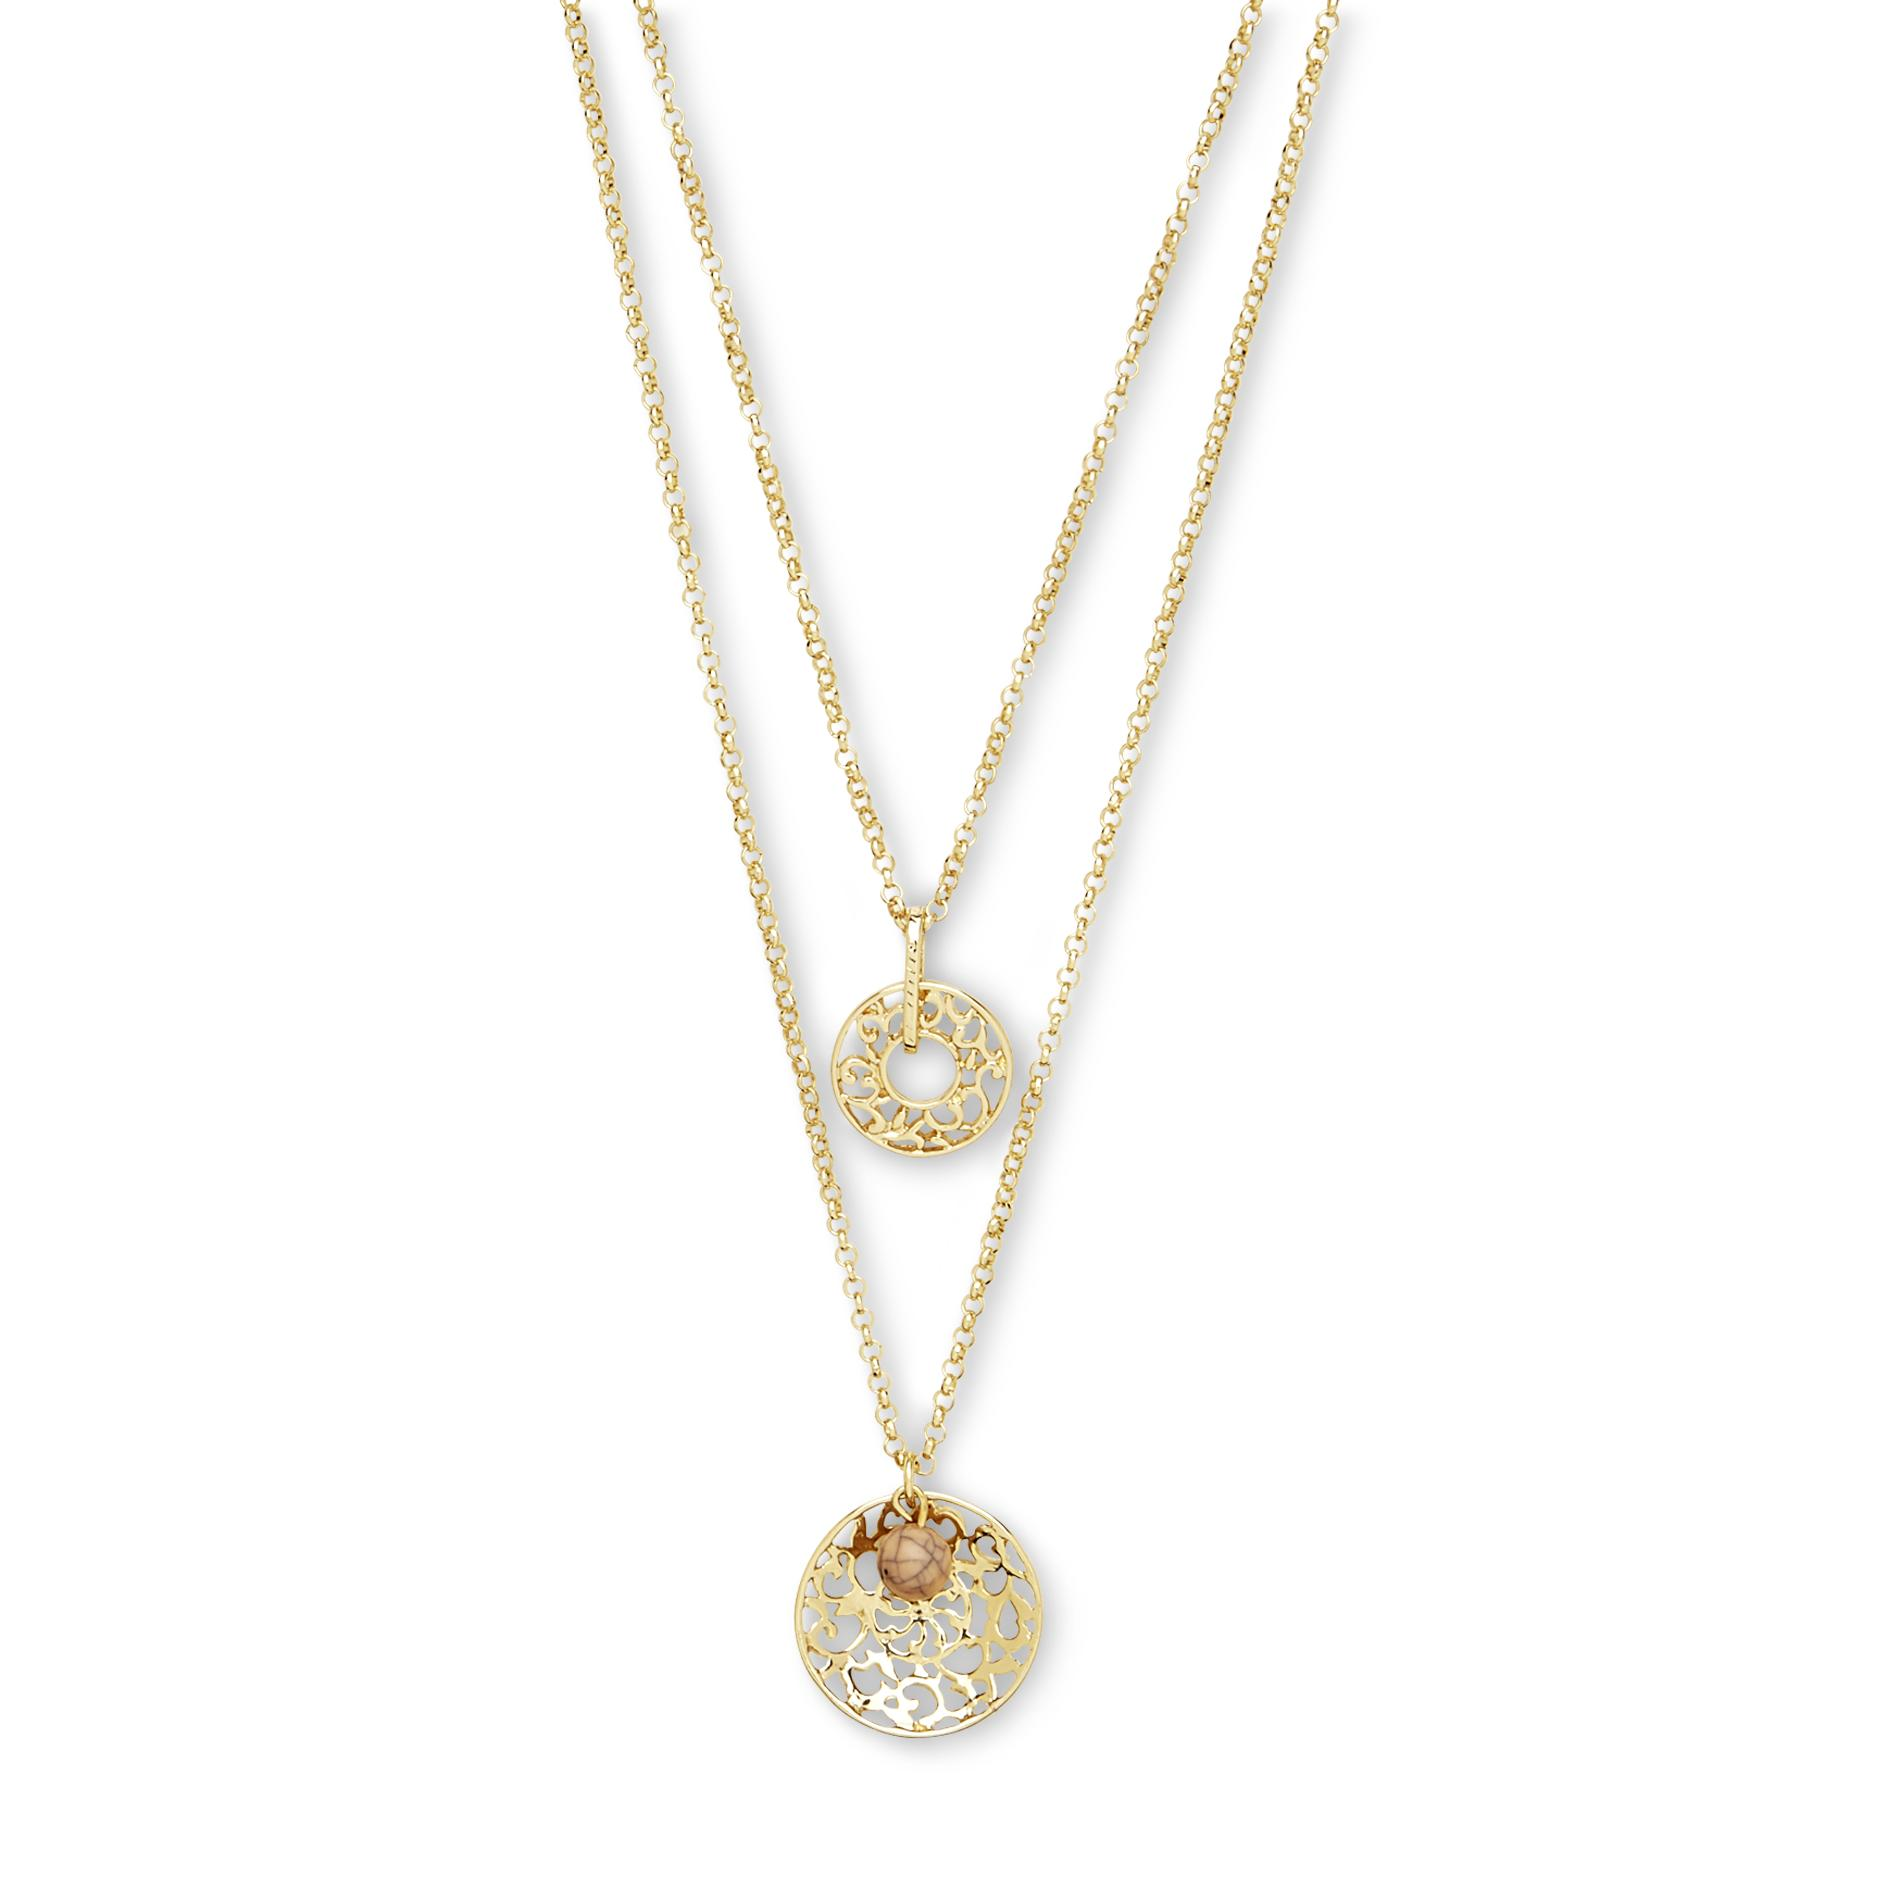 Junior's Silvertone Double Chain Pendant Necklace